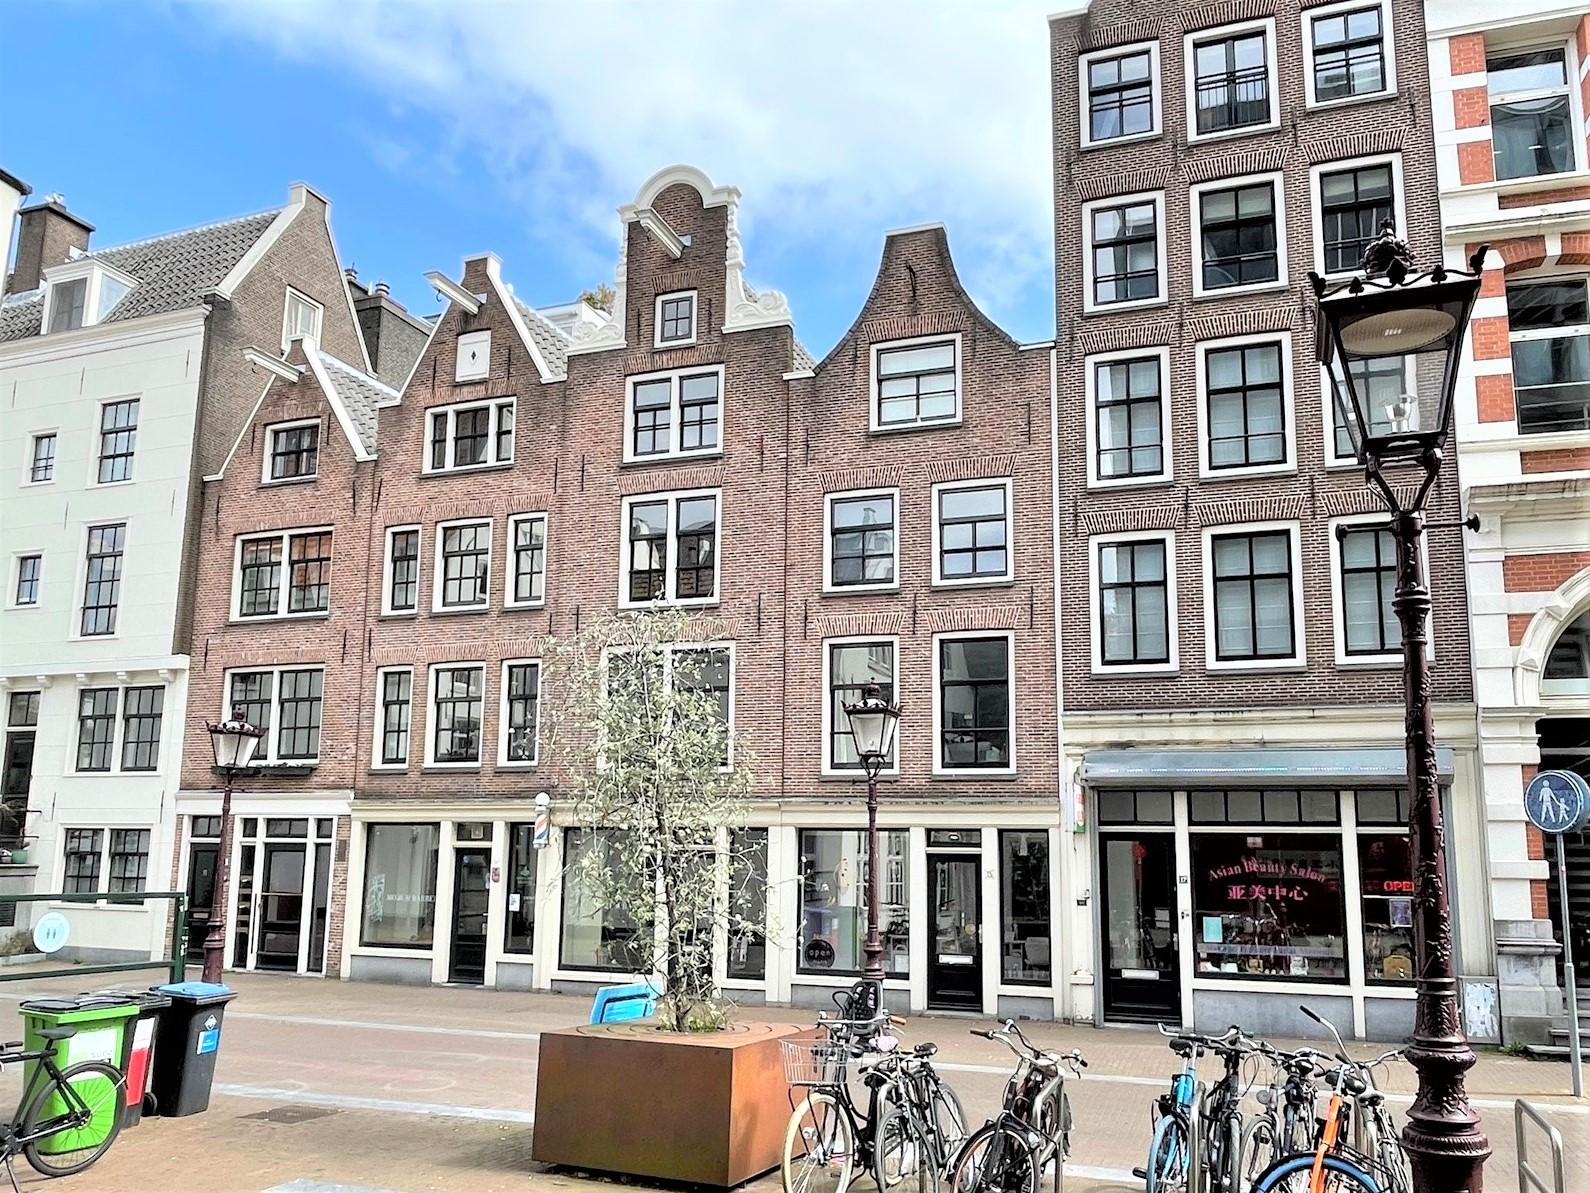 Bakkersstraat, Amsterdam